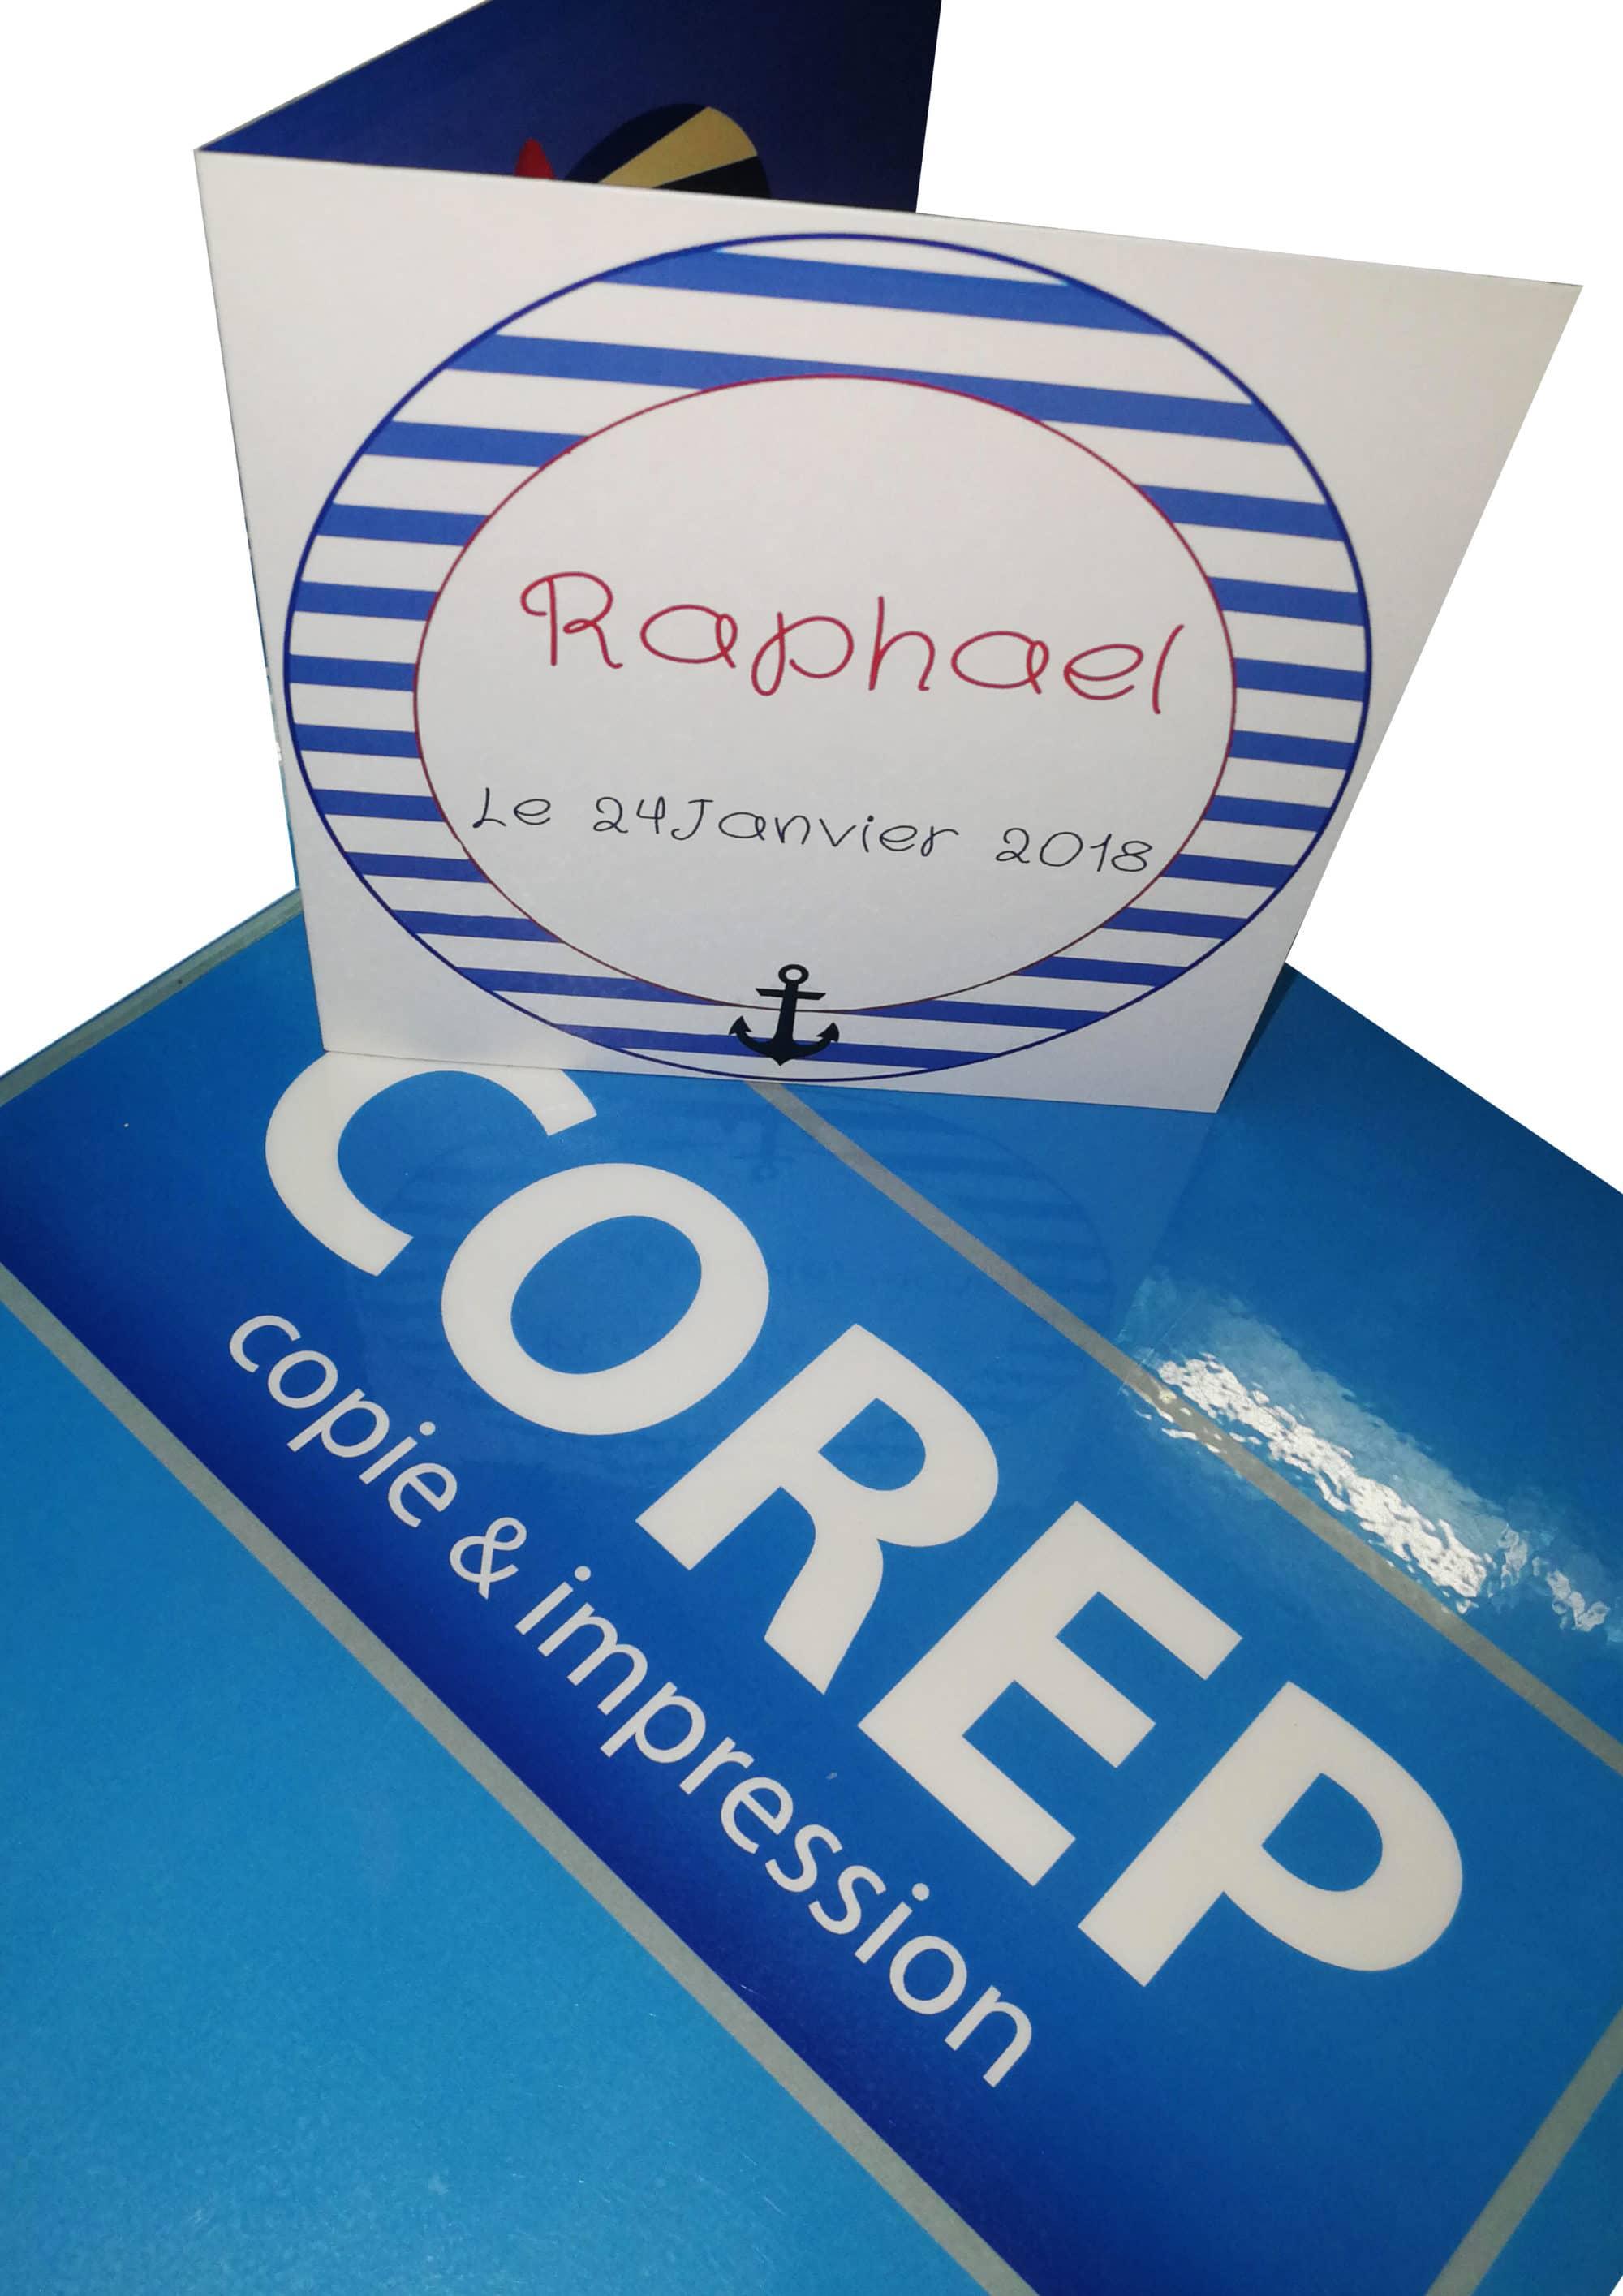 Corep-Rouen